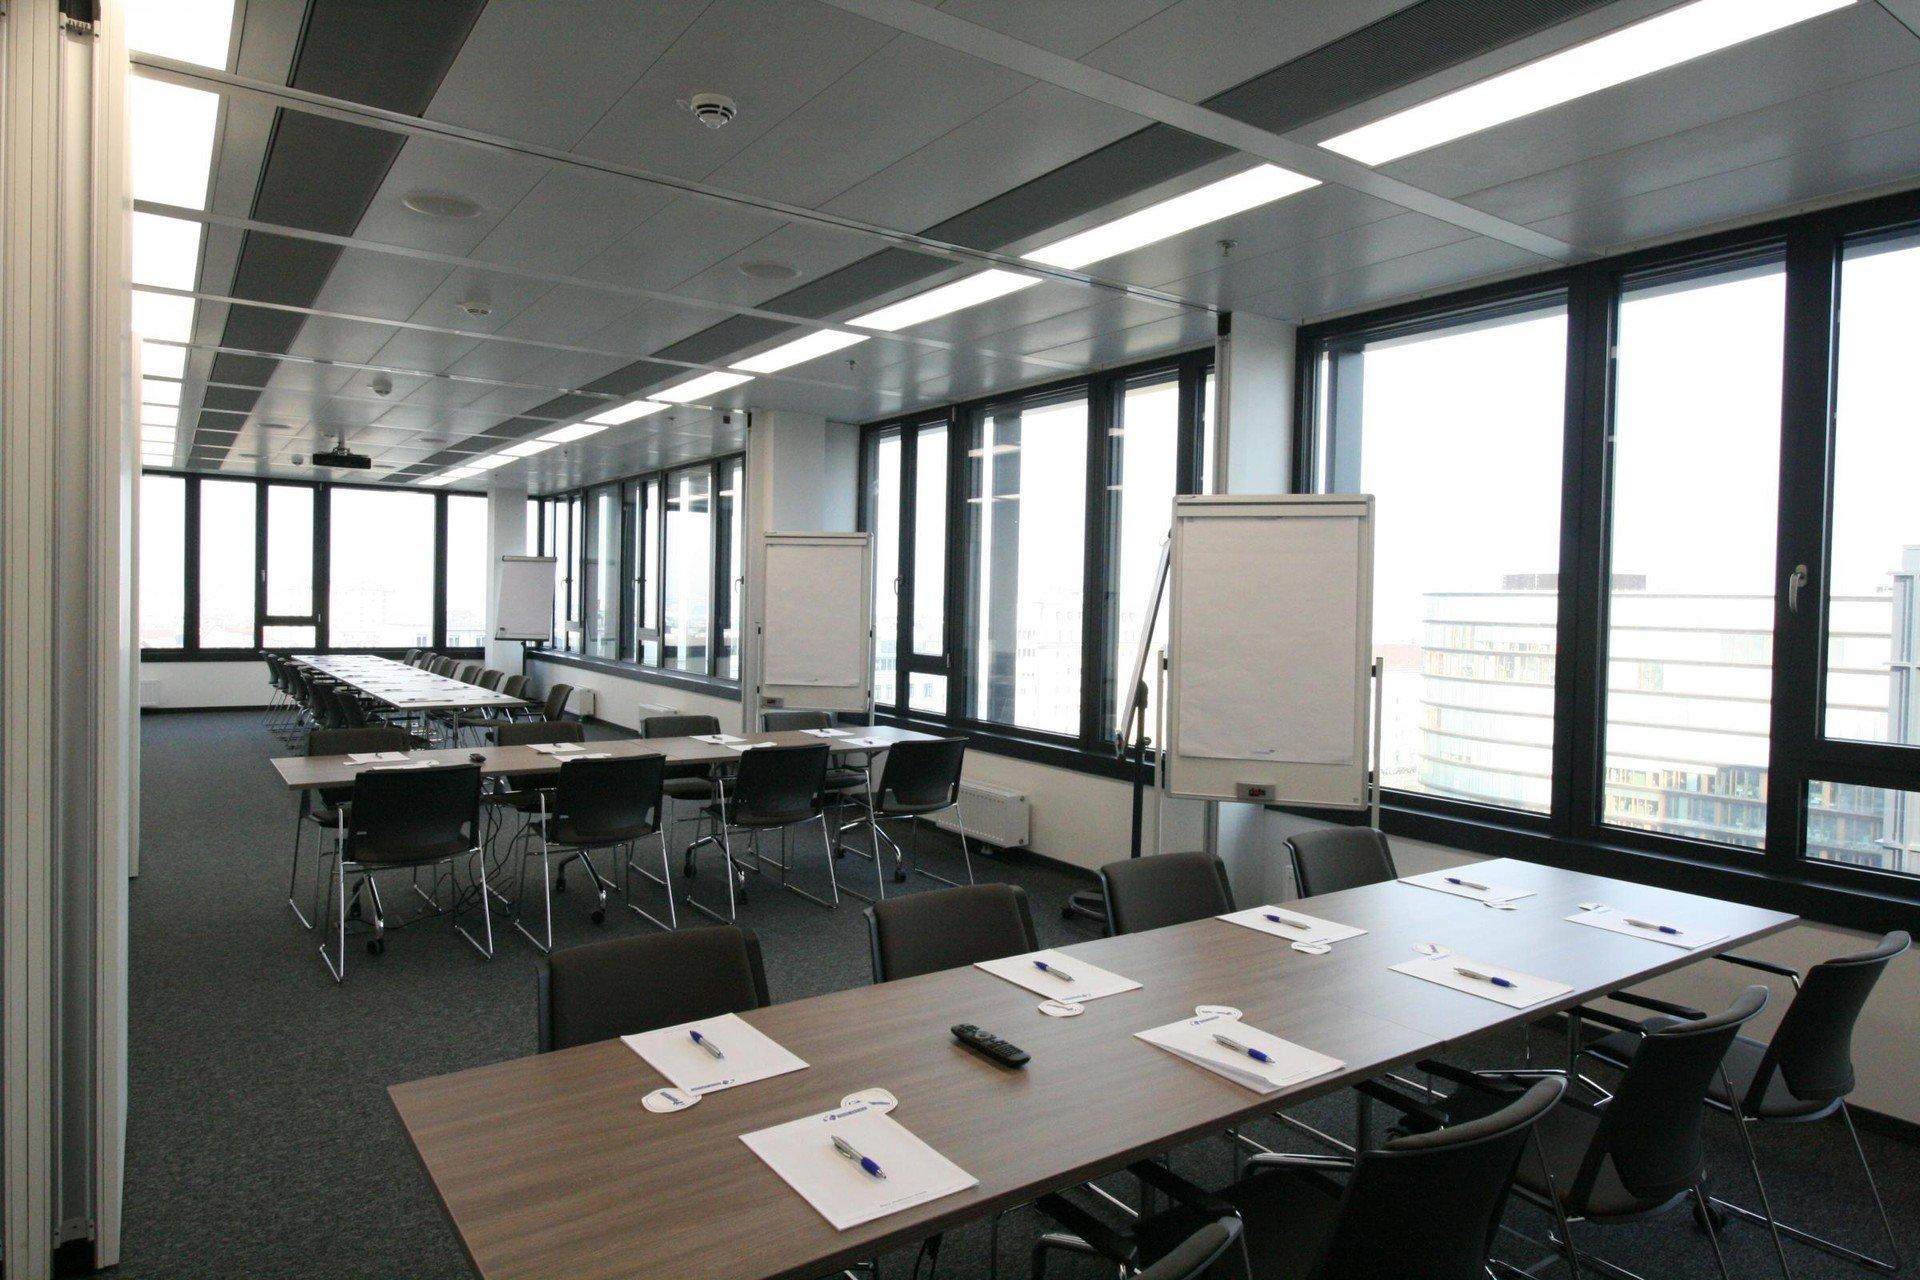 Vienna Schulungsräume Salle de réunion Your Office -  Quartier Belvedere image 0